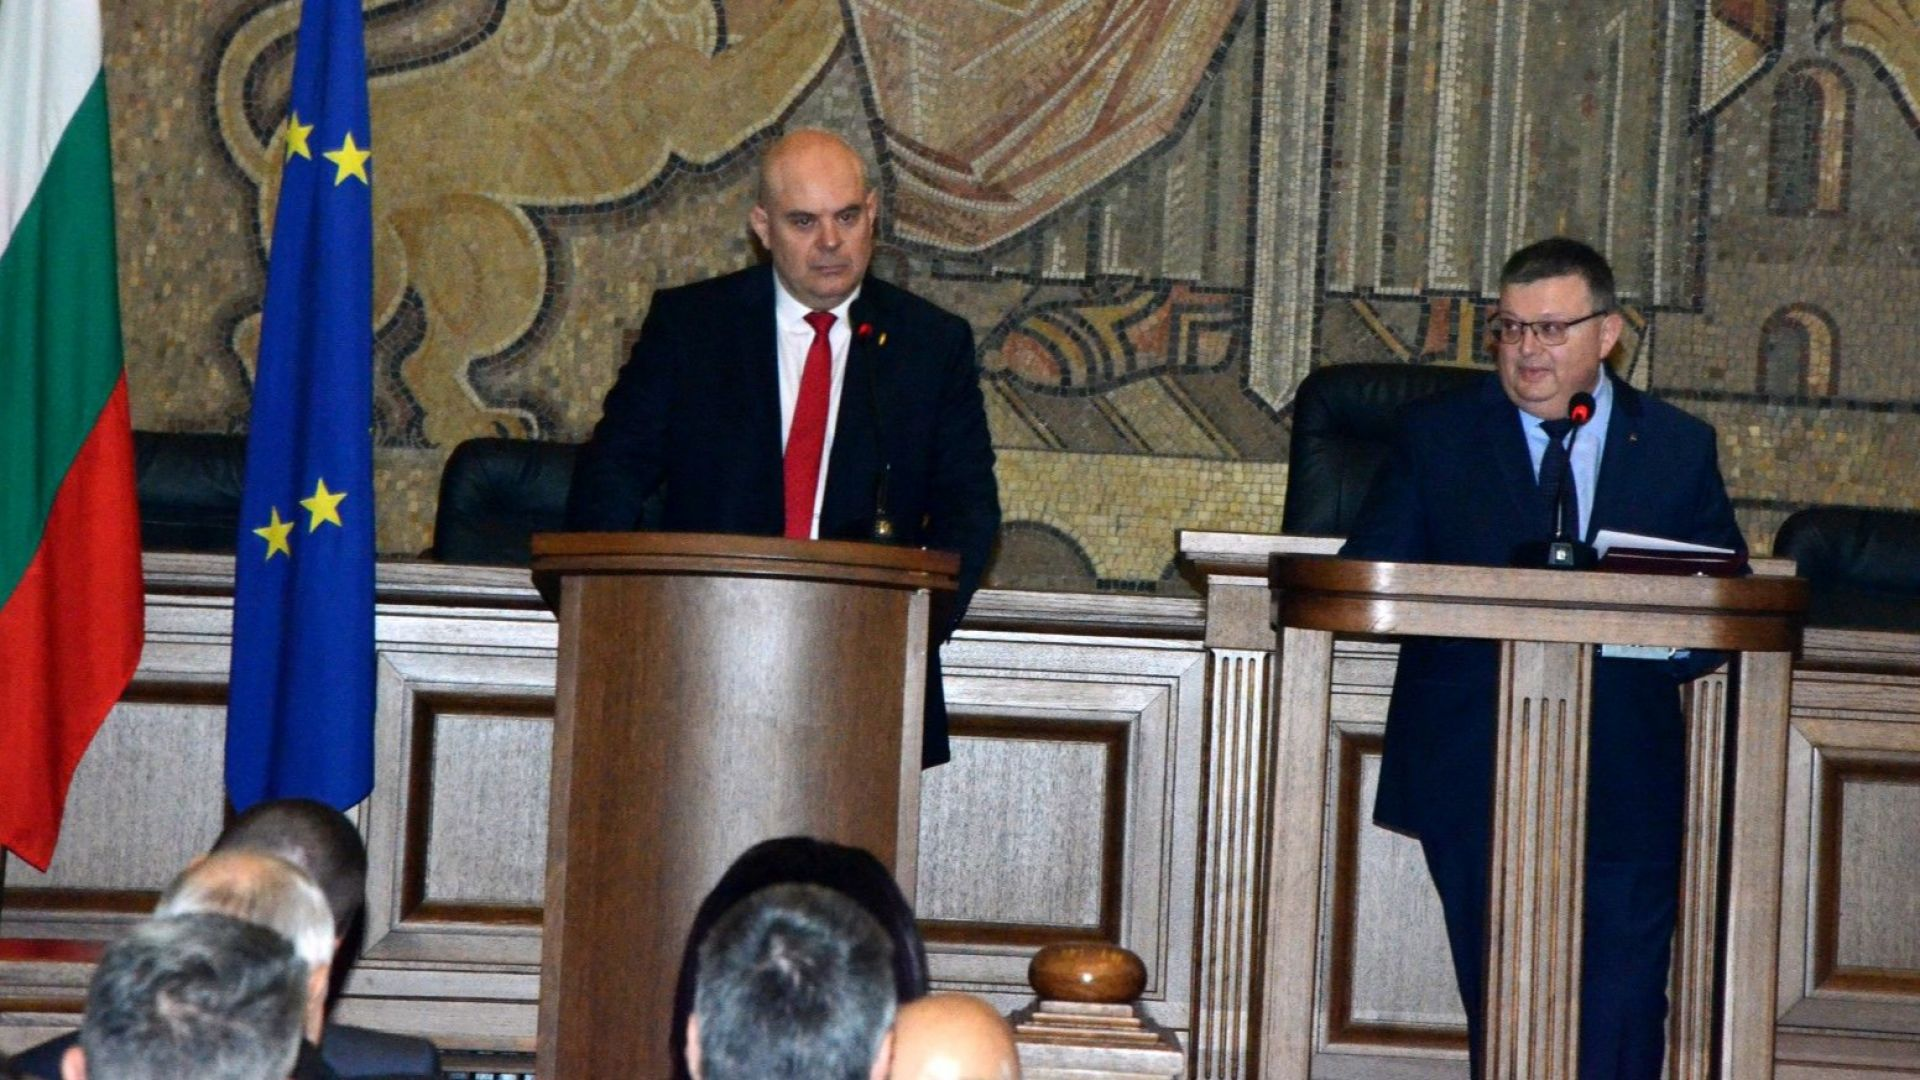 Иван Гешев се закле като главен прокурор в зала